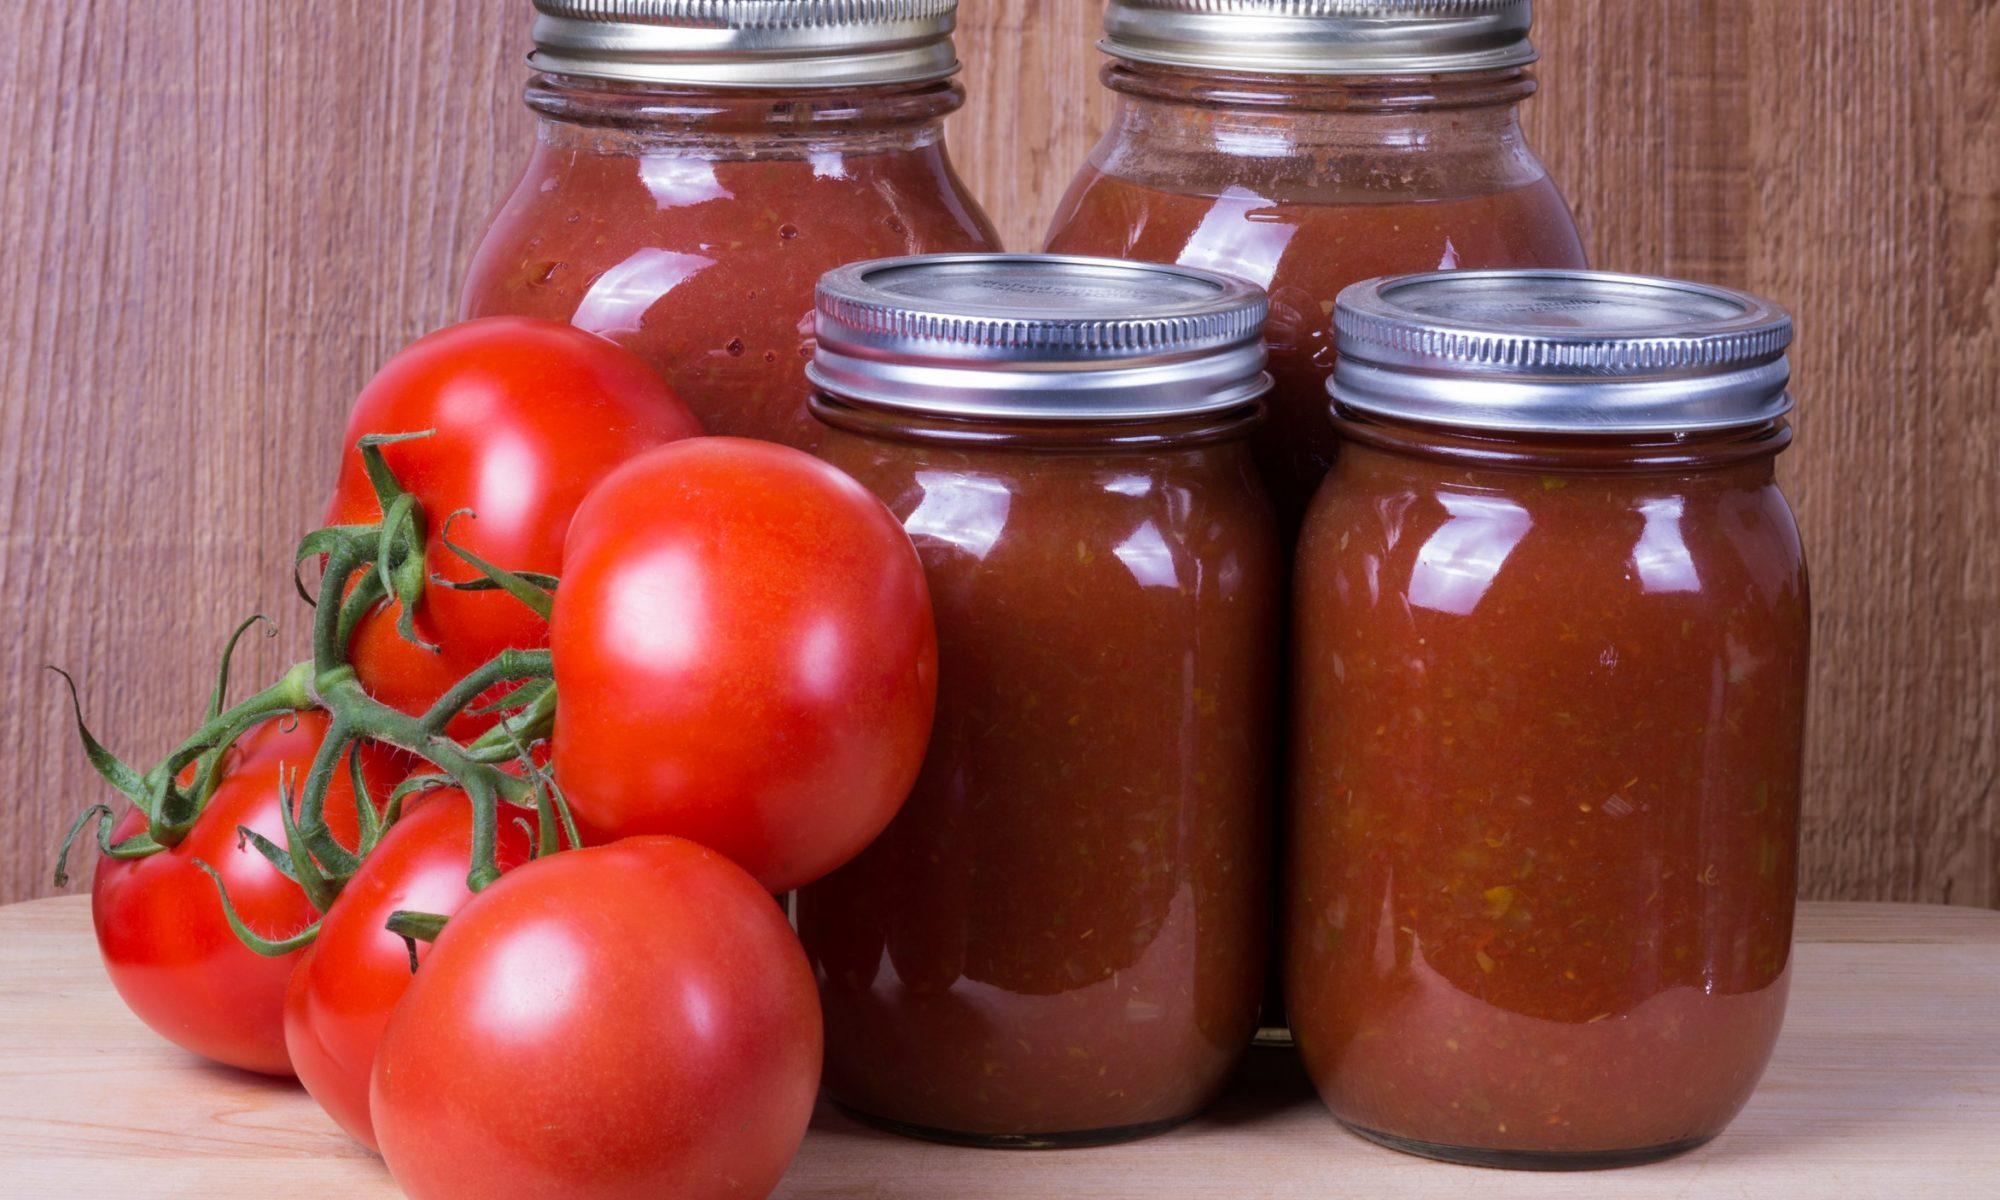 Домашняя заготовка – помидоры с хреном без варки